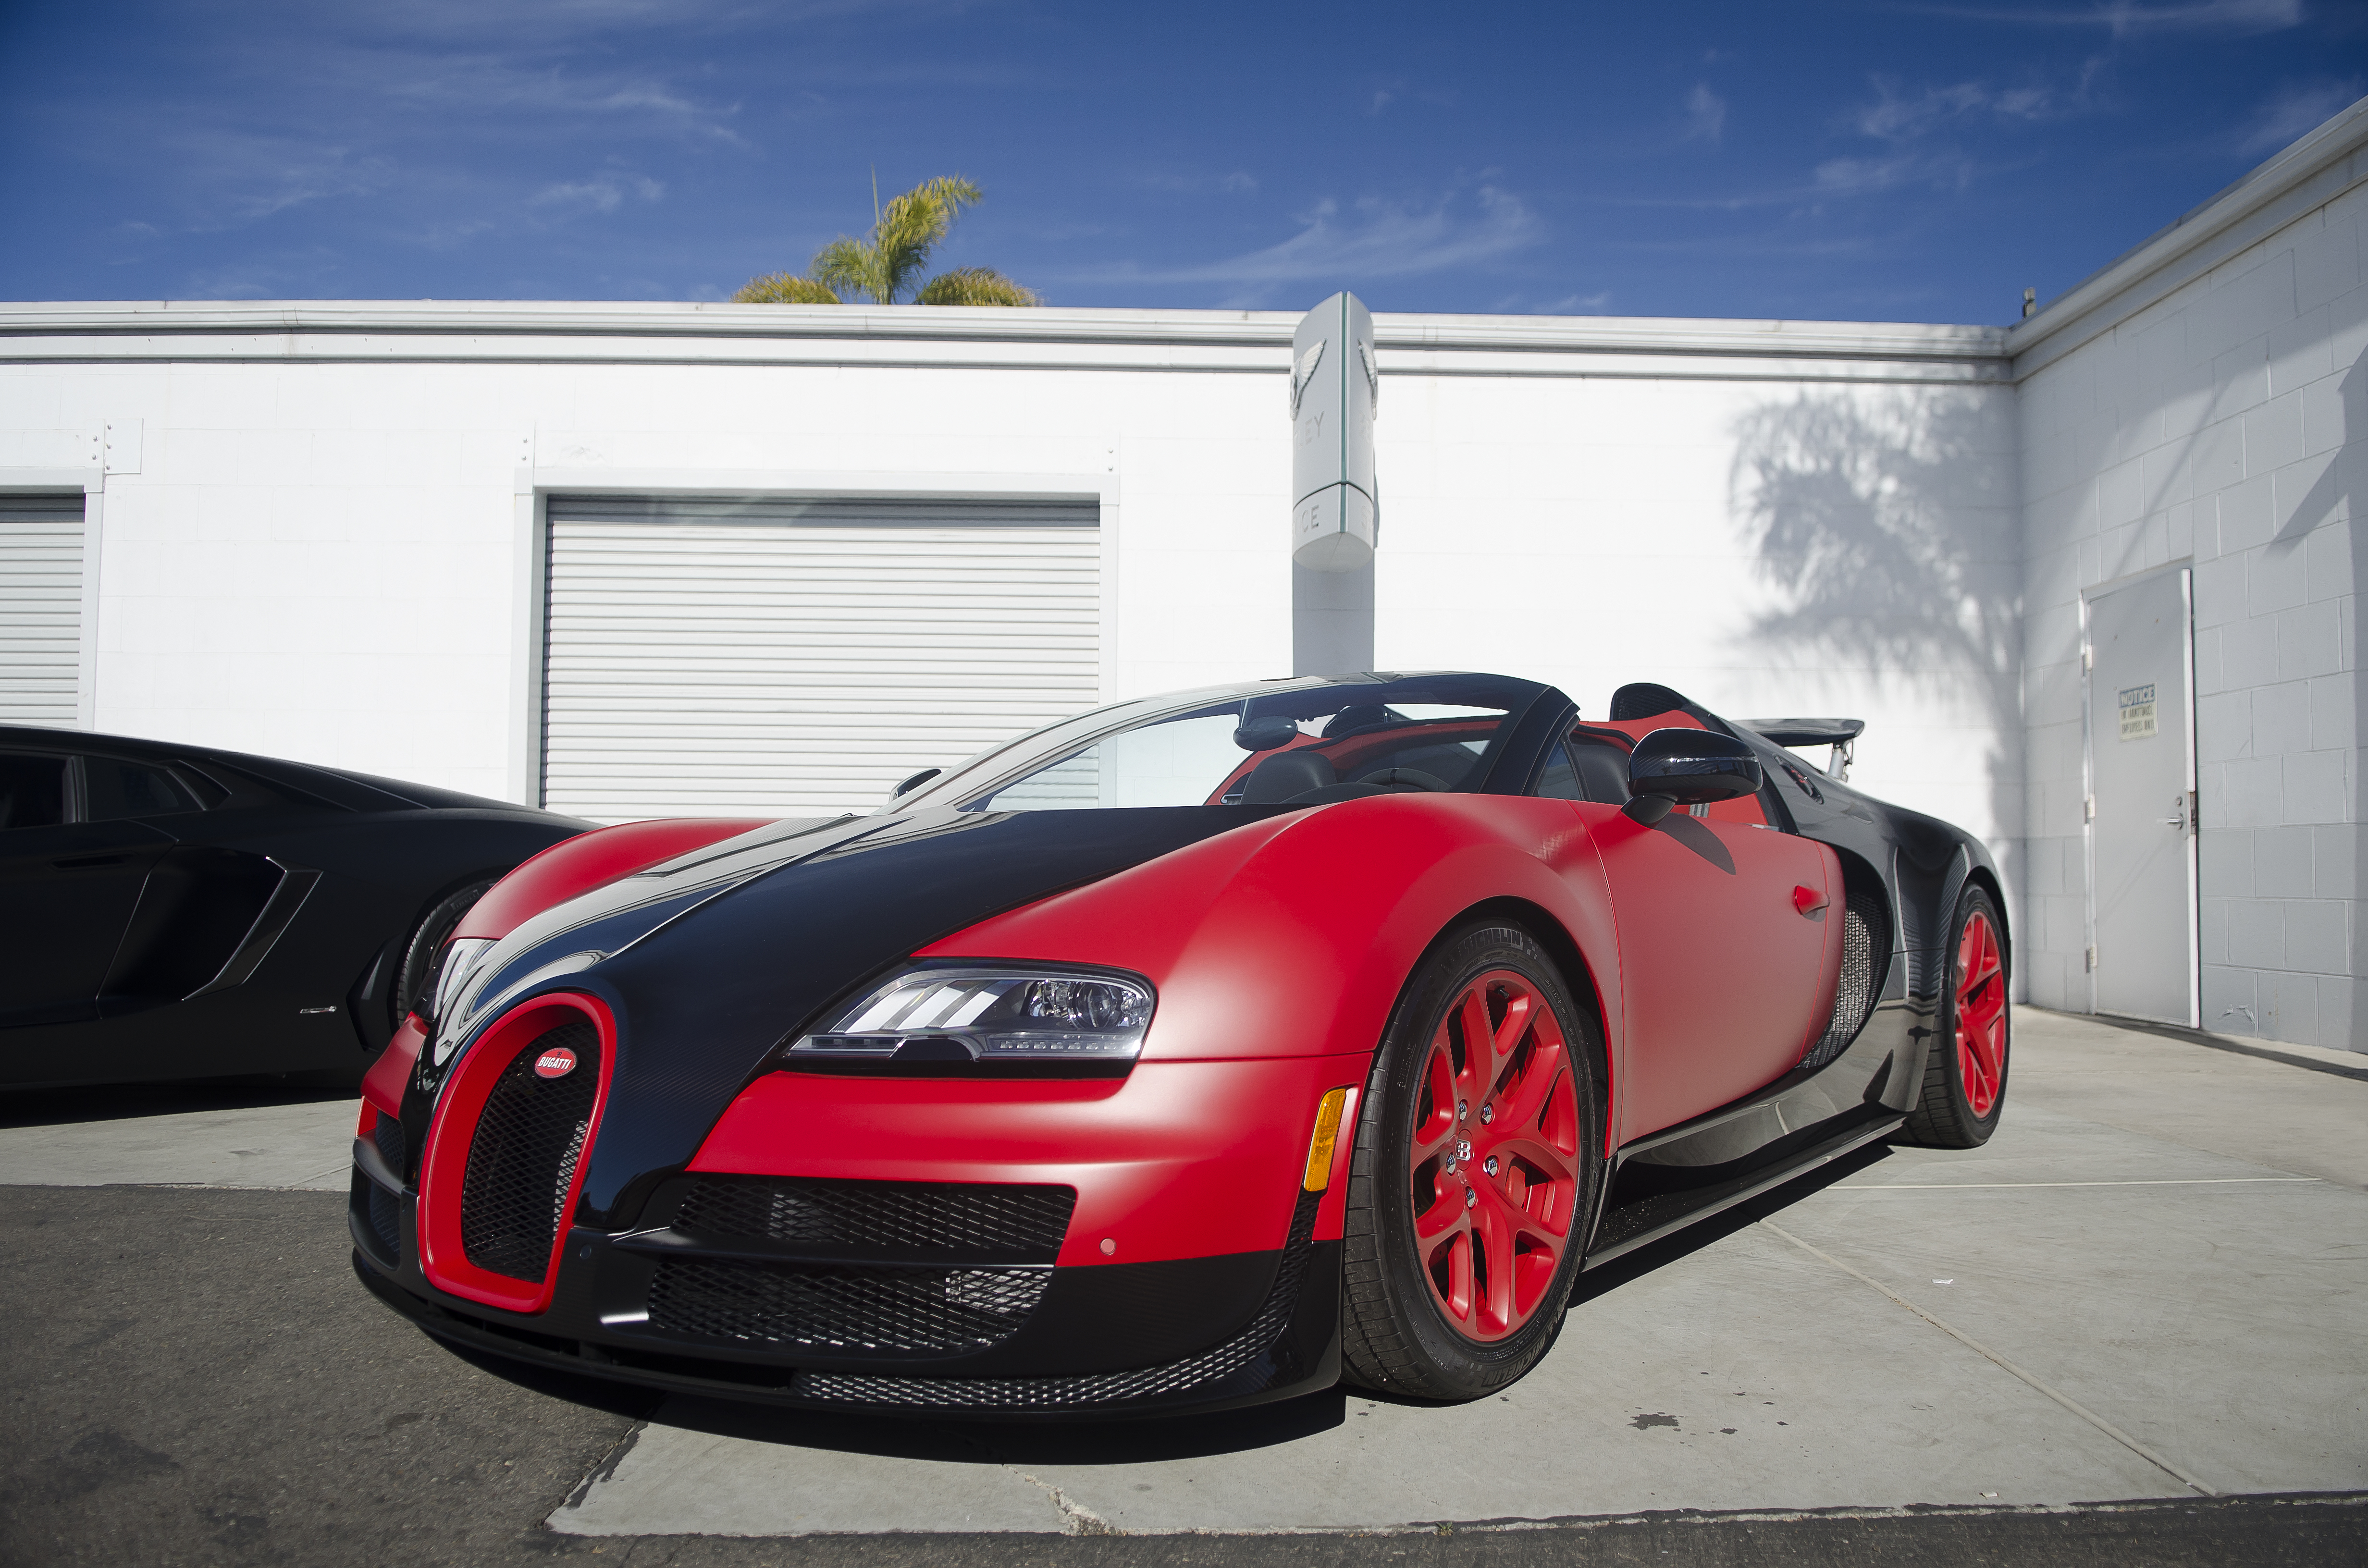 Matte_Red-Black_Bugatti_Veyron_Grand_Sport_Vitesse_%2815832617282%29 Extraordinary Bugatti Veyron Grand Sport Vitesse Cars Trend